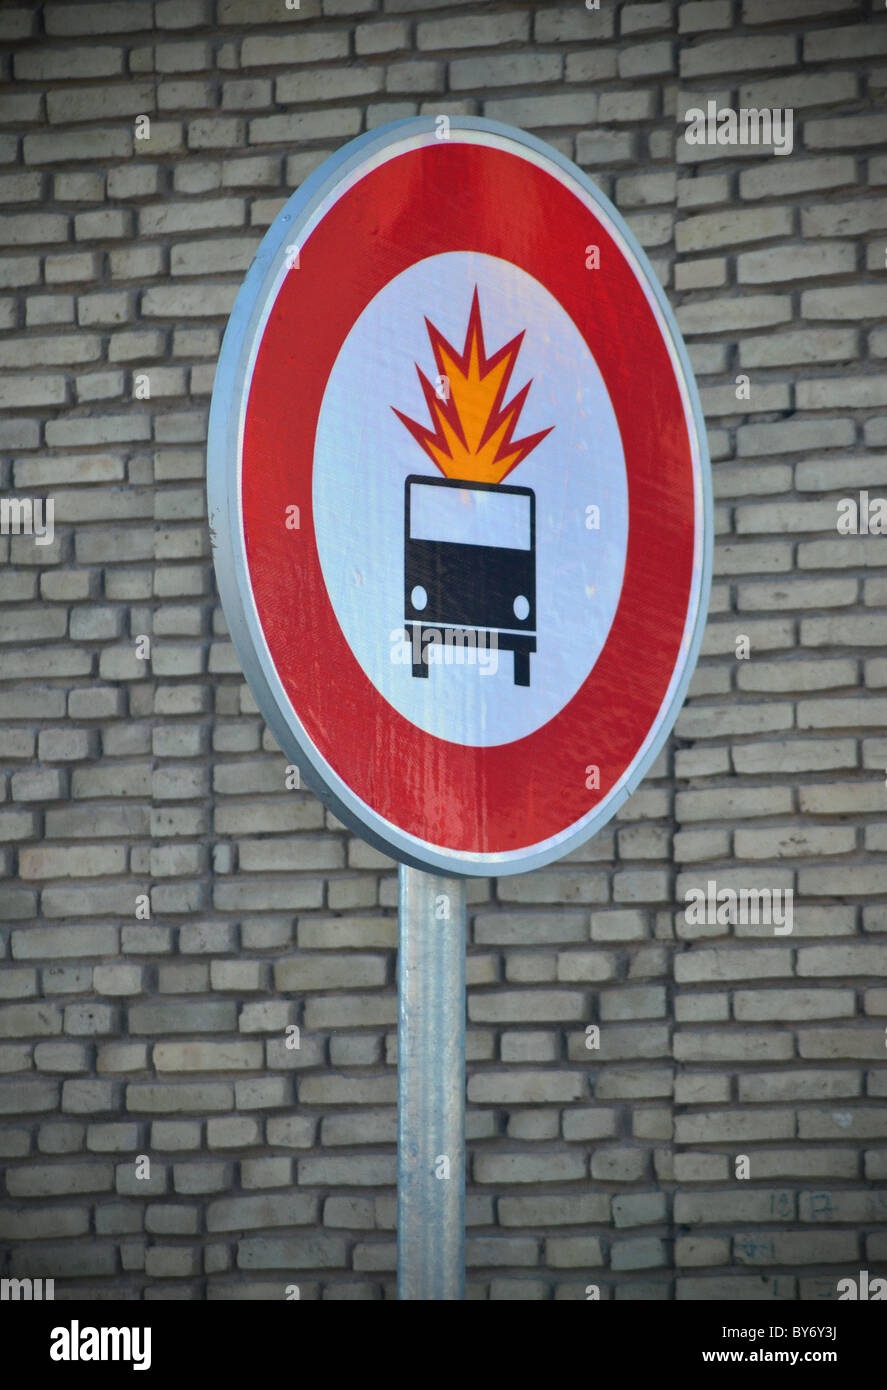 Odd roadsign sign in Tunisia - Stock Image